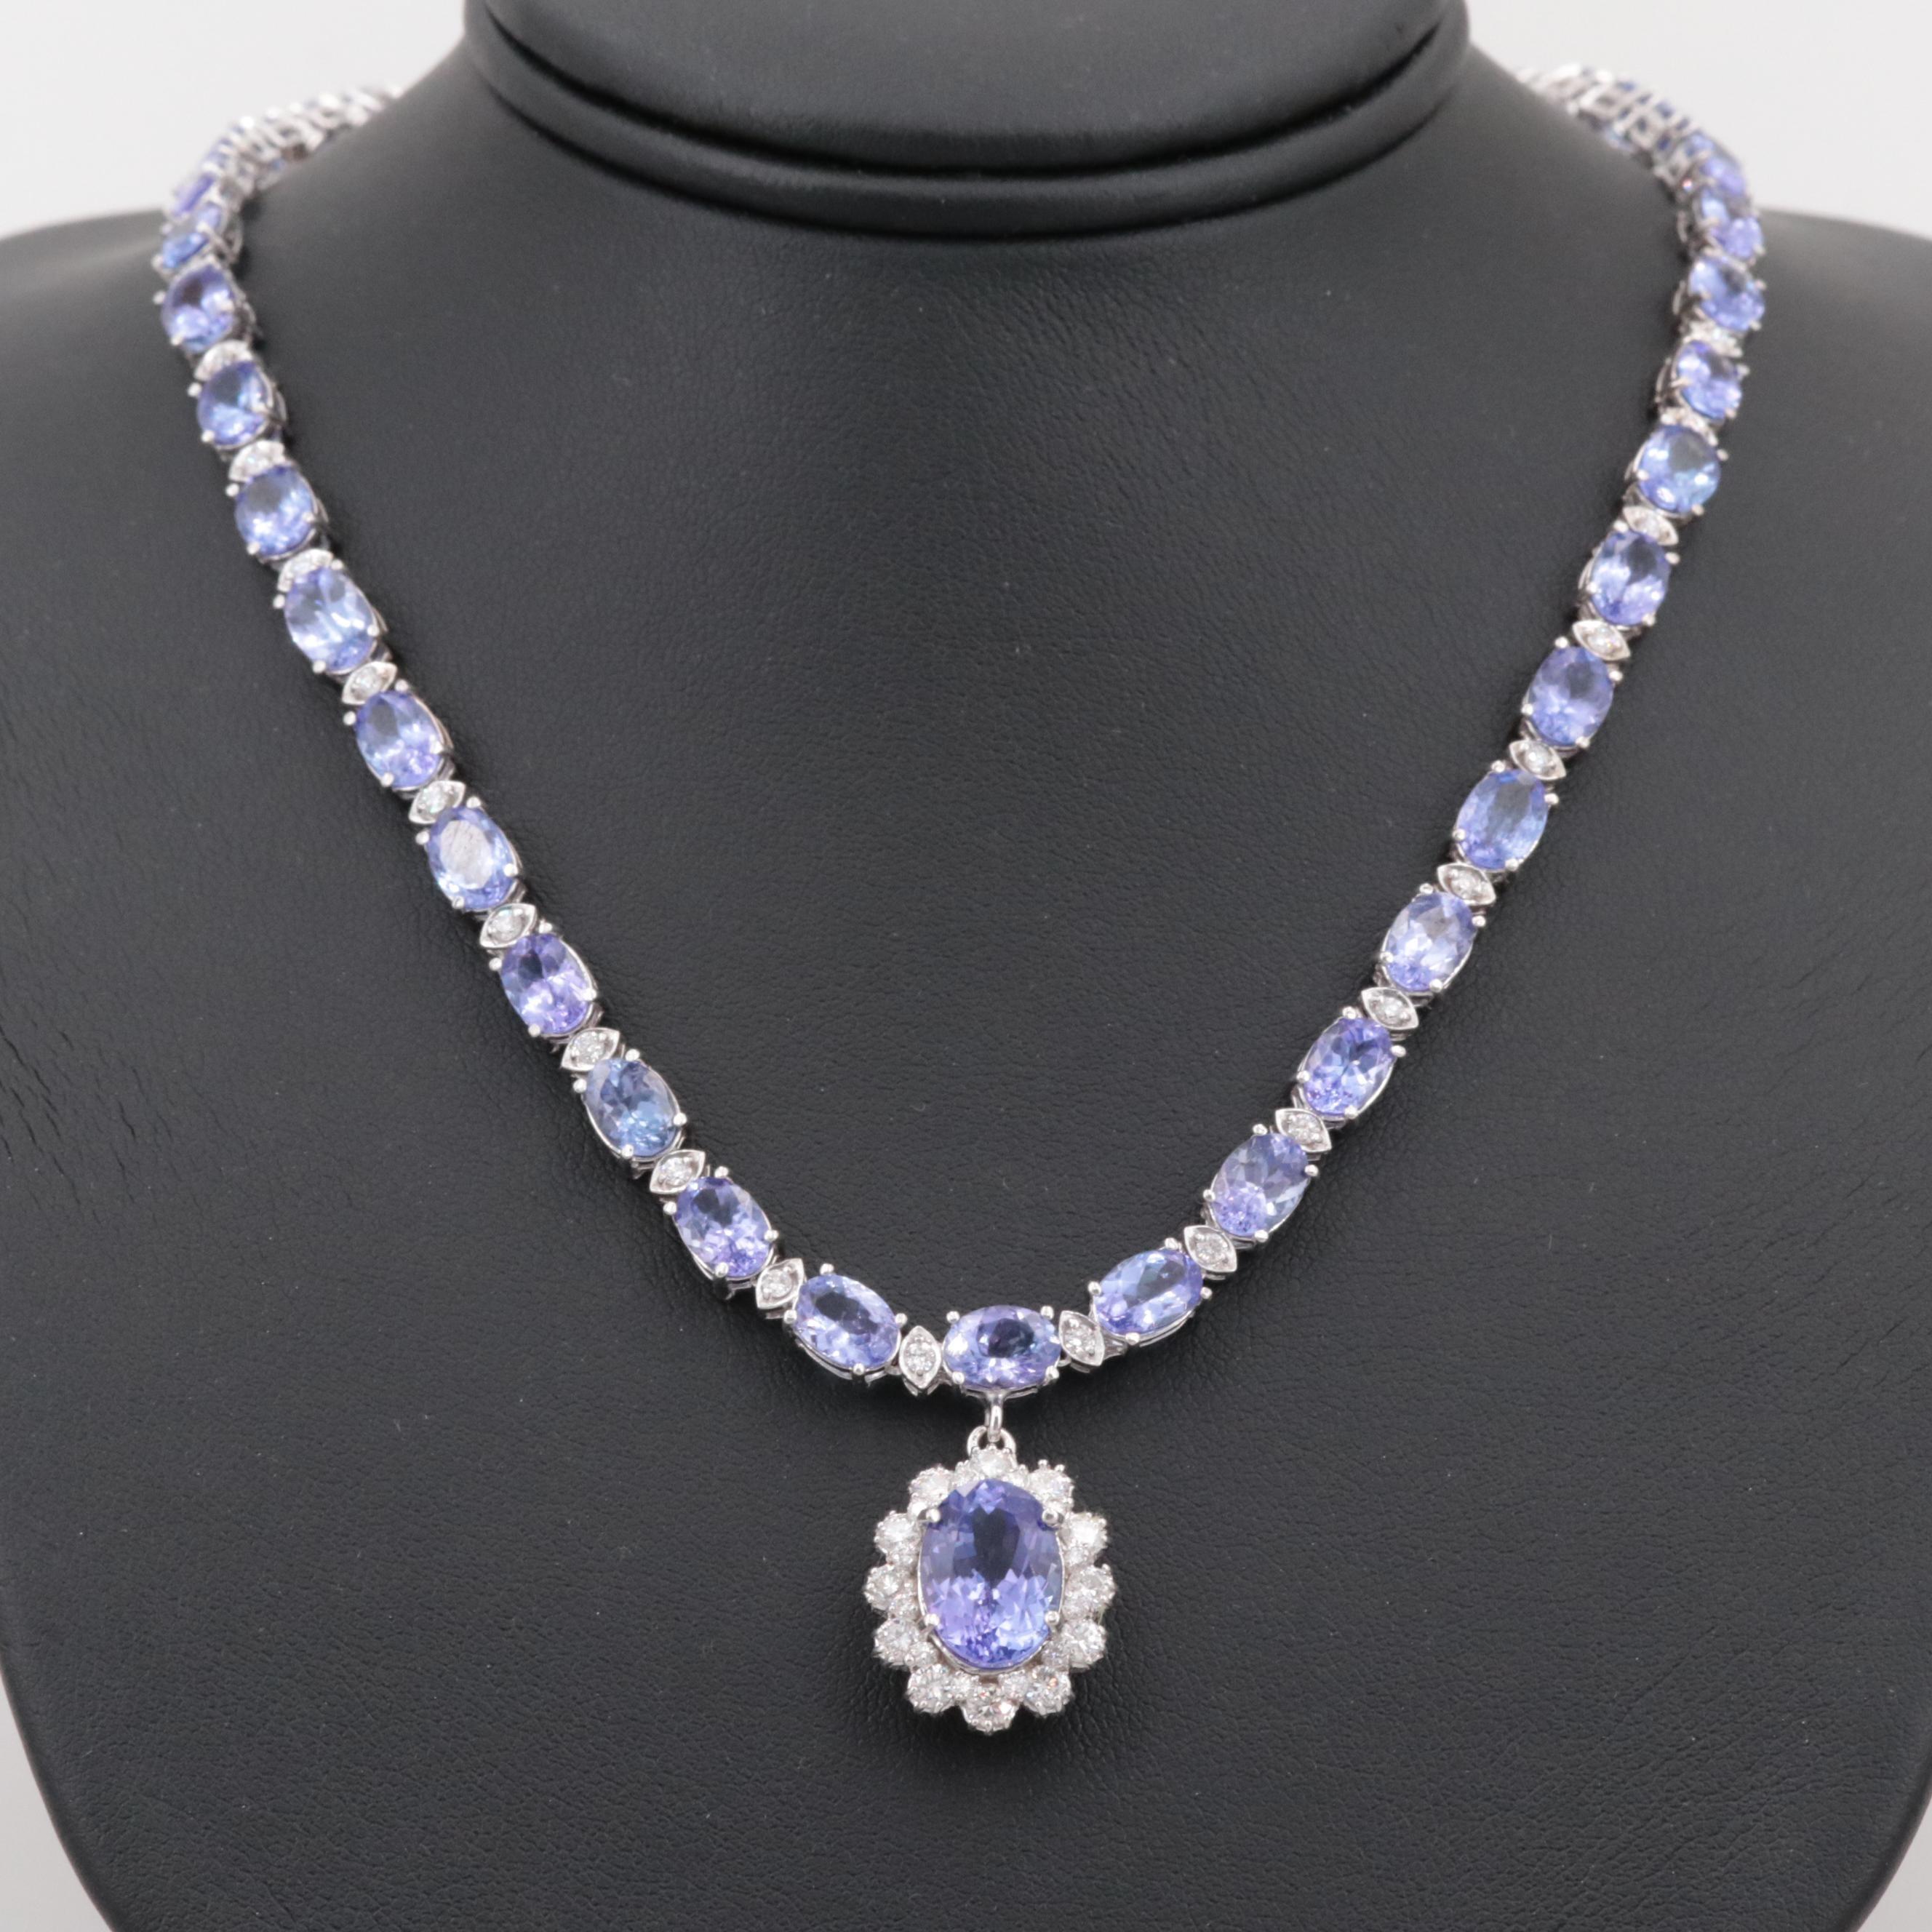 14K White Gold 4.13 CT Tanzanite and 2.18 CTW Diamond Necklace